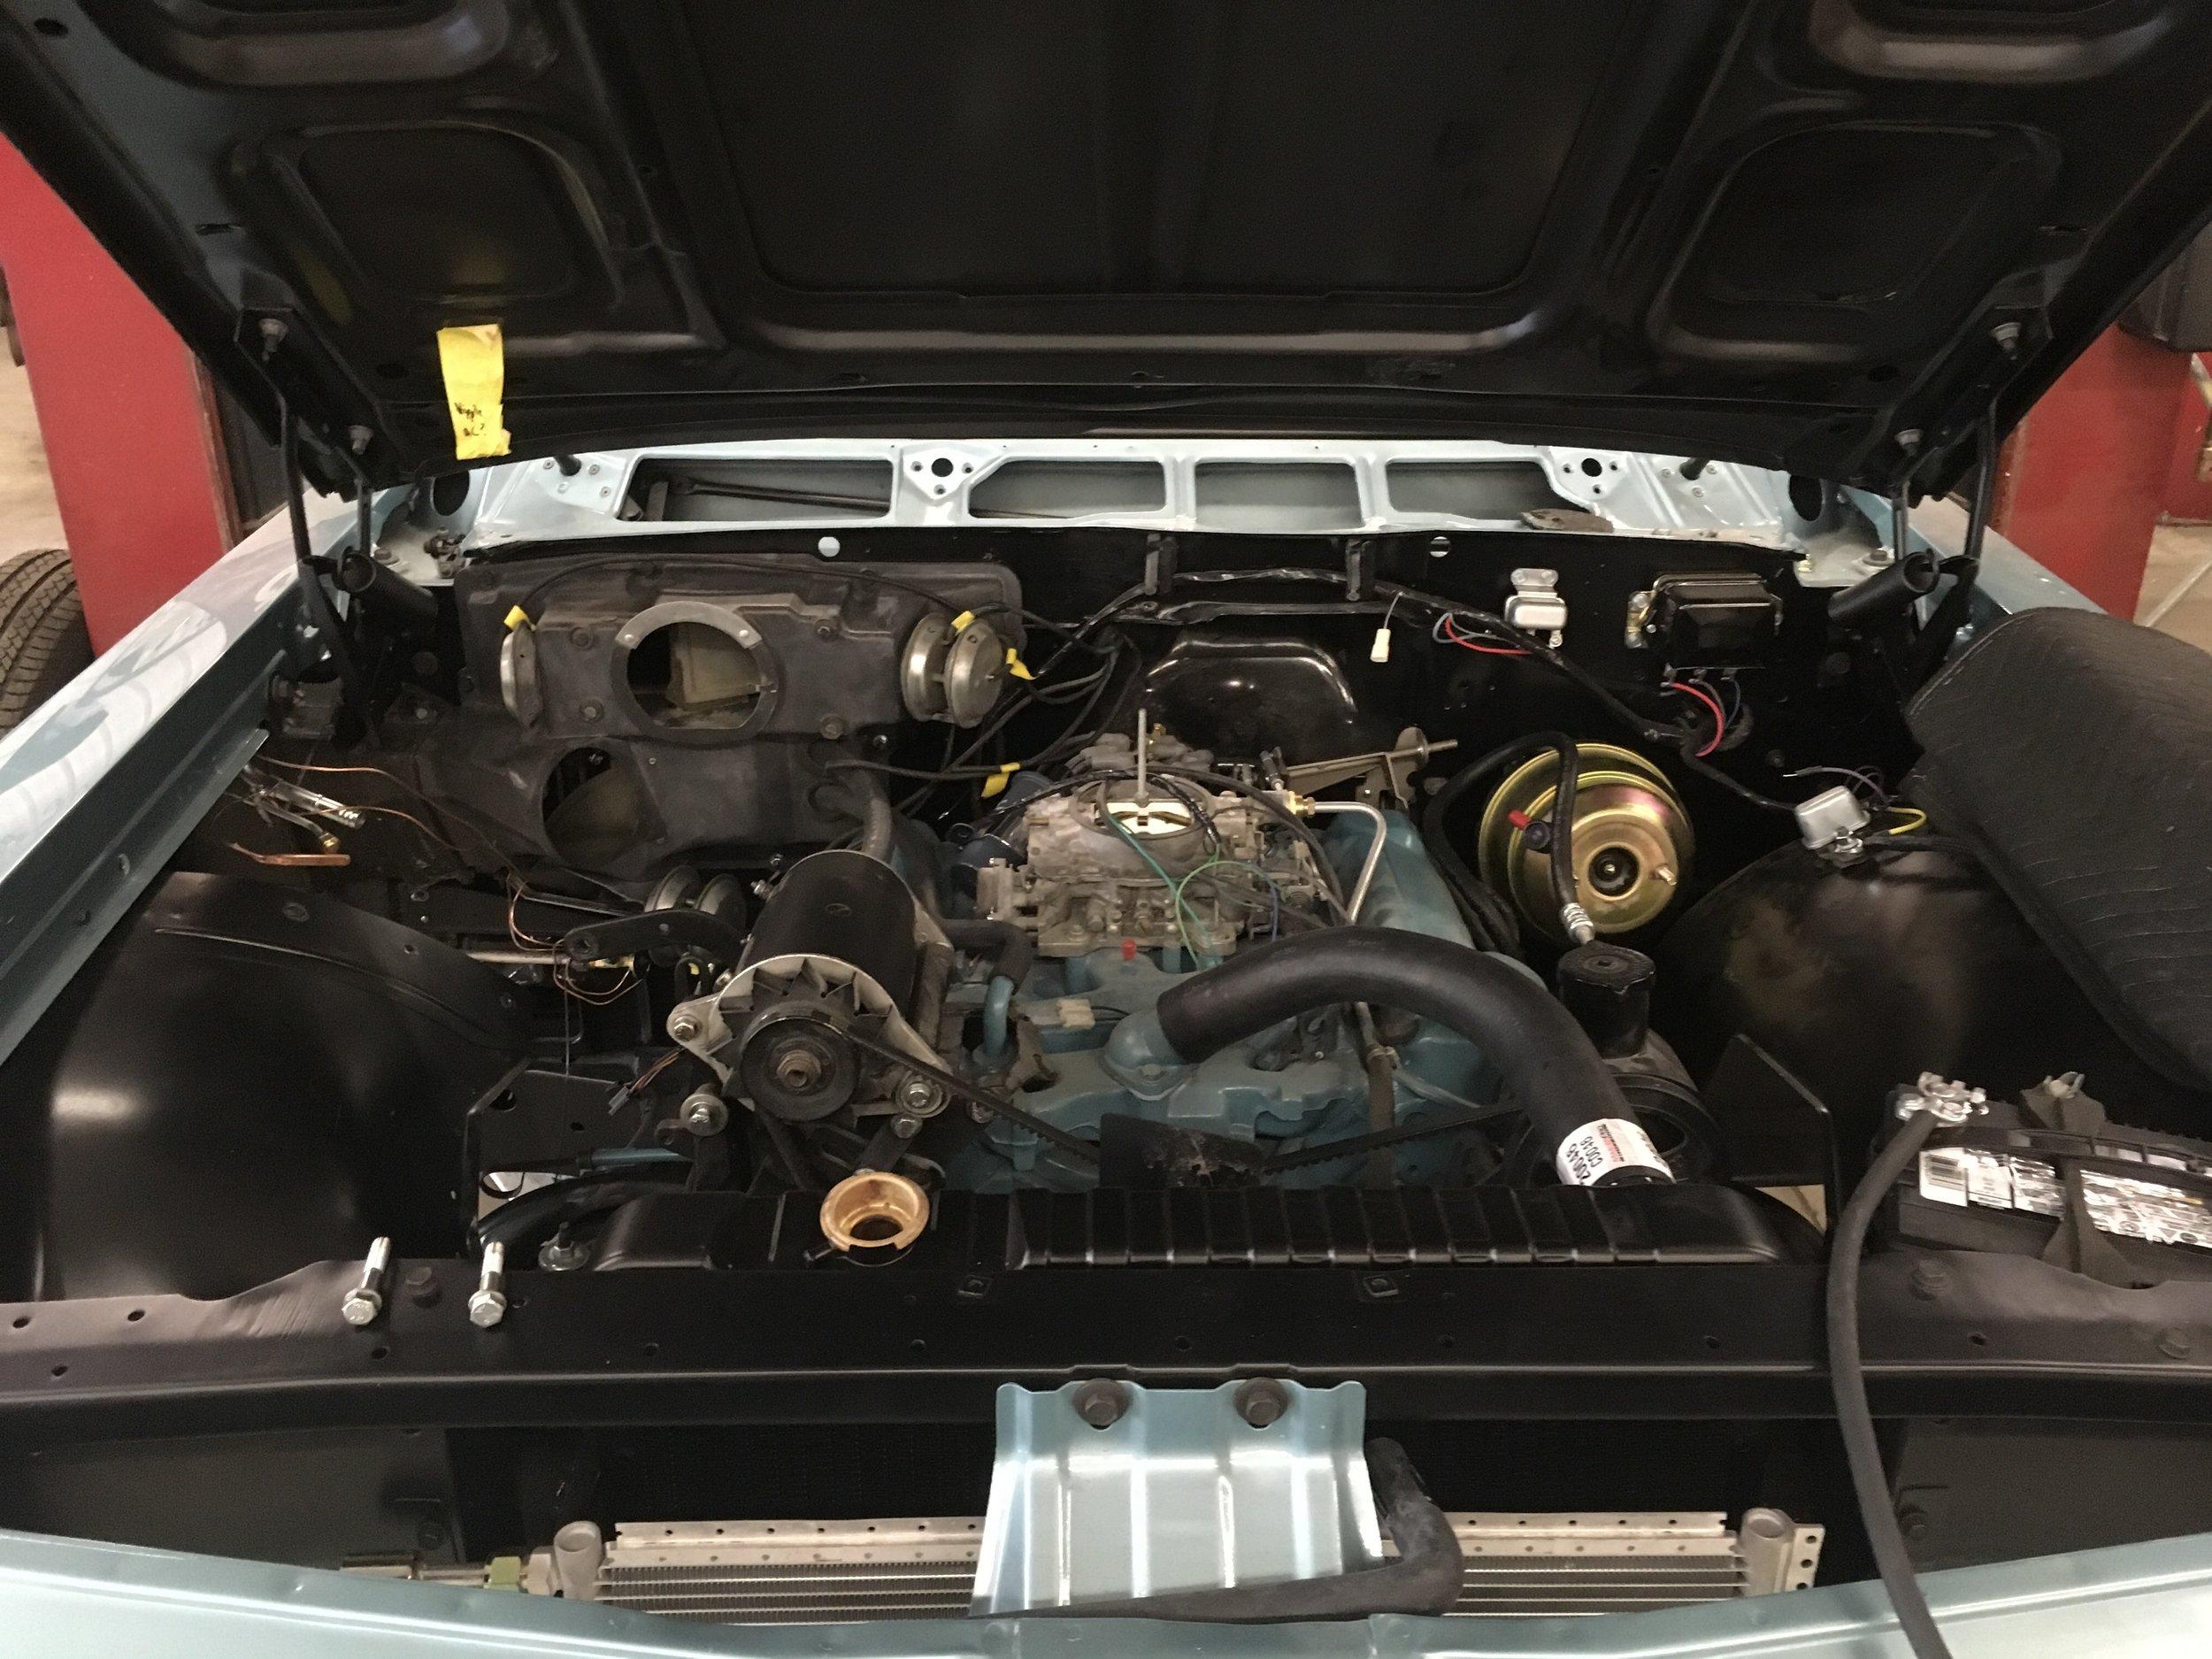 image.jpg1962-Pontiac-Bonneville-minneapolis-hot-rod-custom-build-restoration-engine.jpg